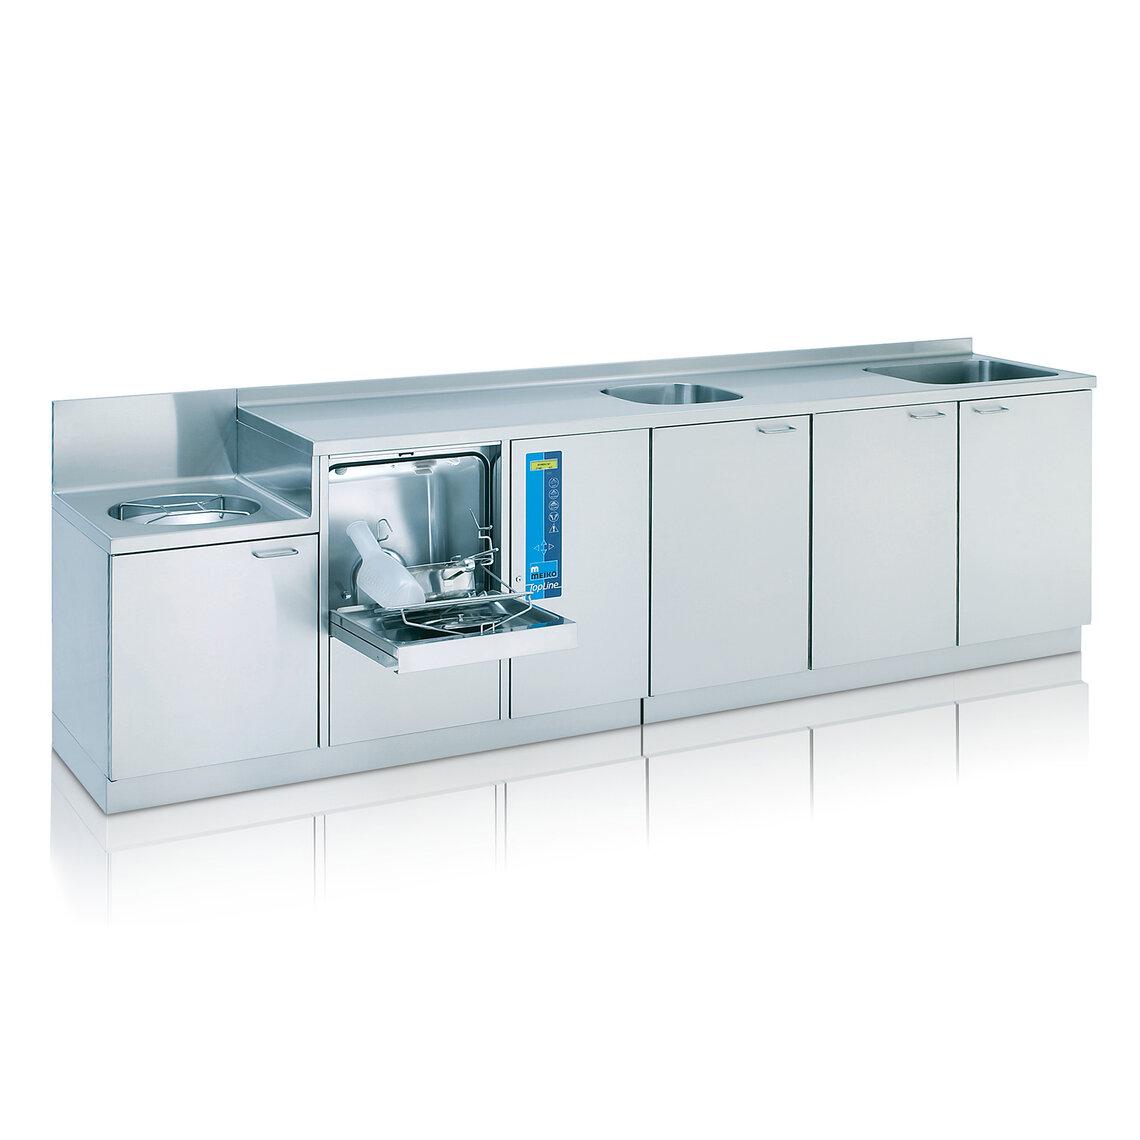 Combined sluice units for hospital hygiene - MEIKO